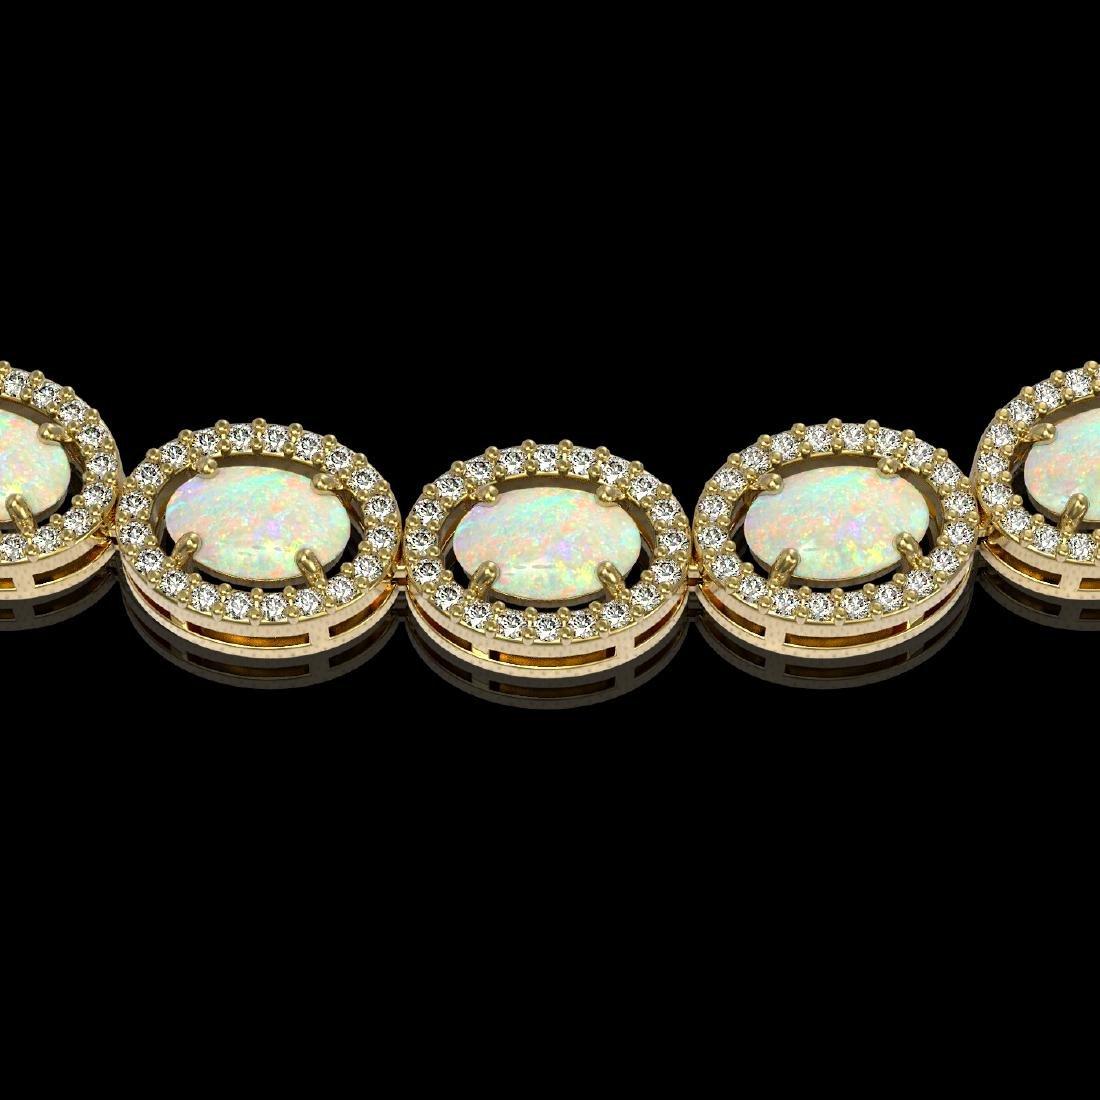 21.21 CTW Opal & Diamond Halo Necklace 10K Yellow Gold - 3